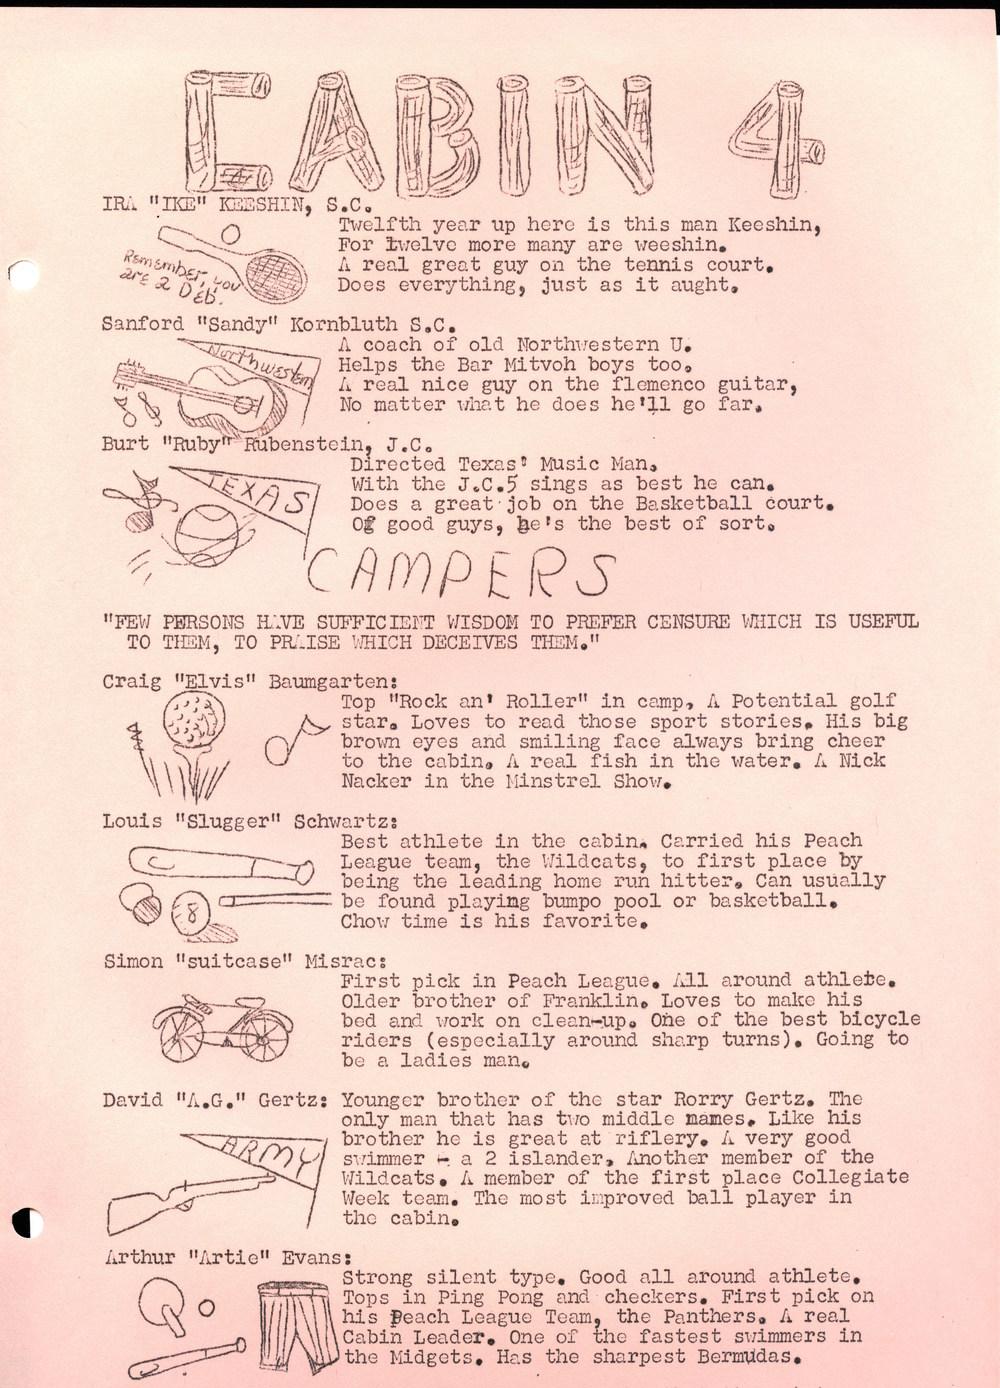 1959 Warrior Camp Ojibwa History Project